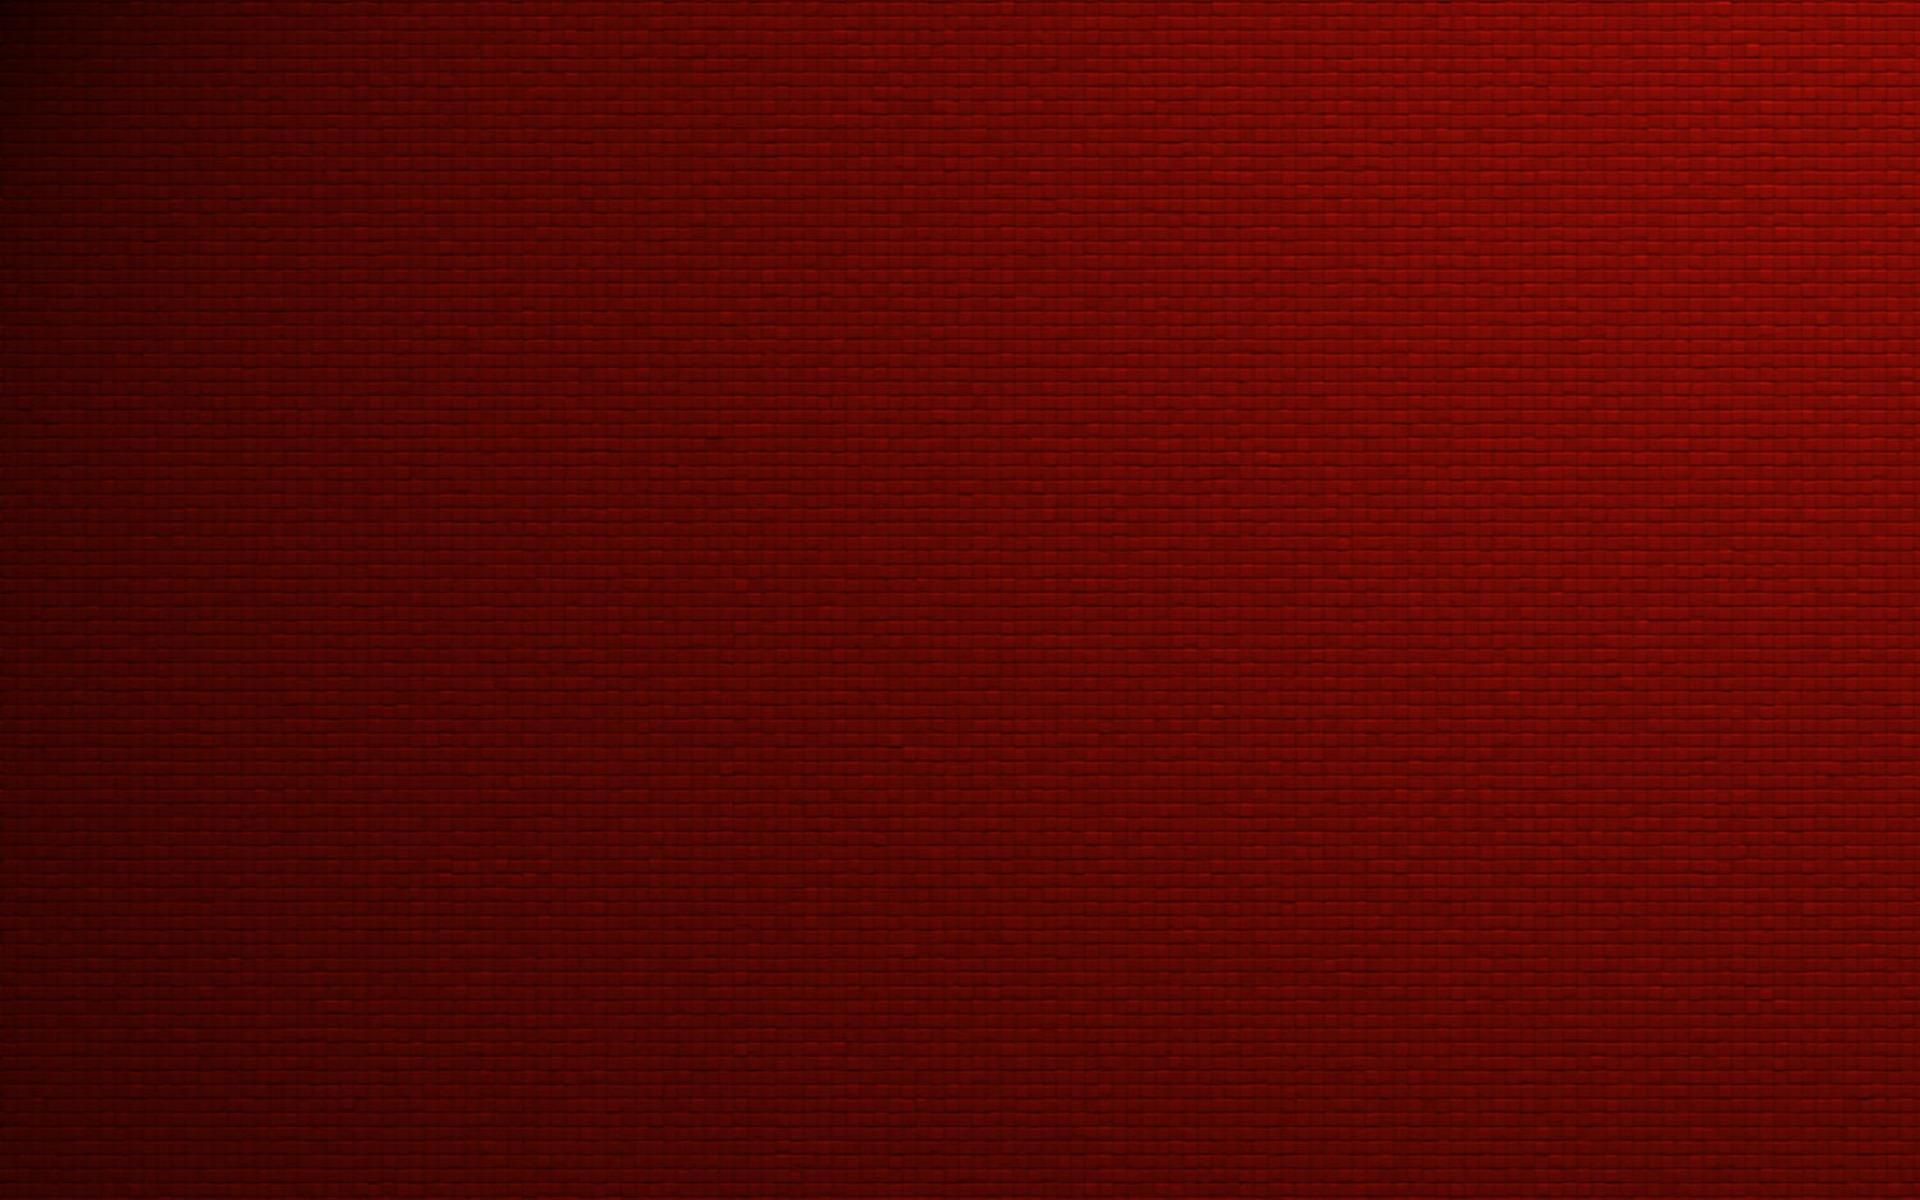 Red Wallpapers For Desktop Wallpaper Cave